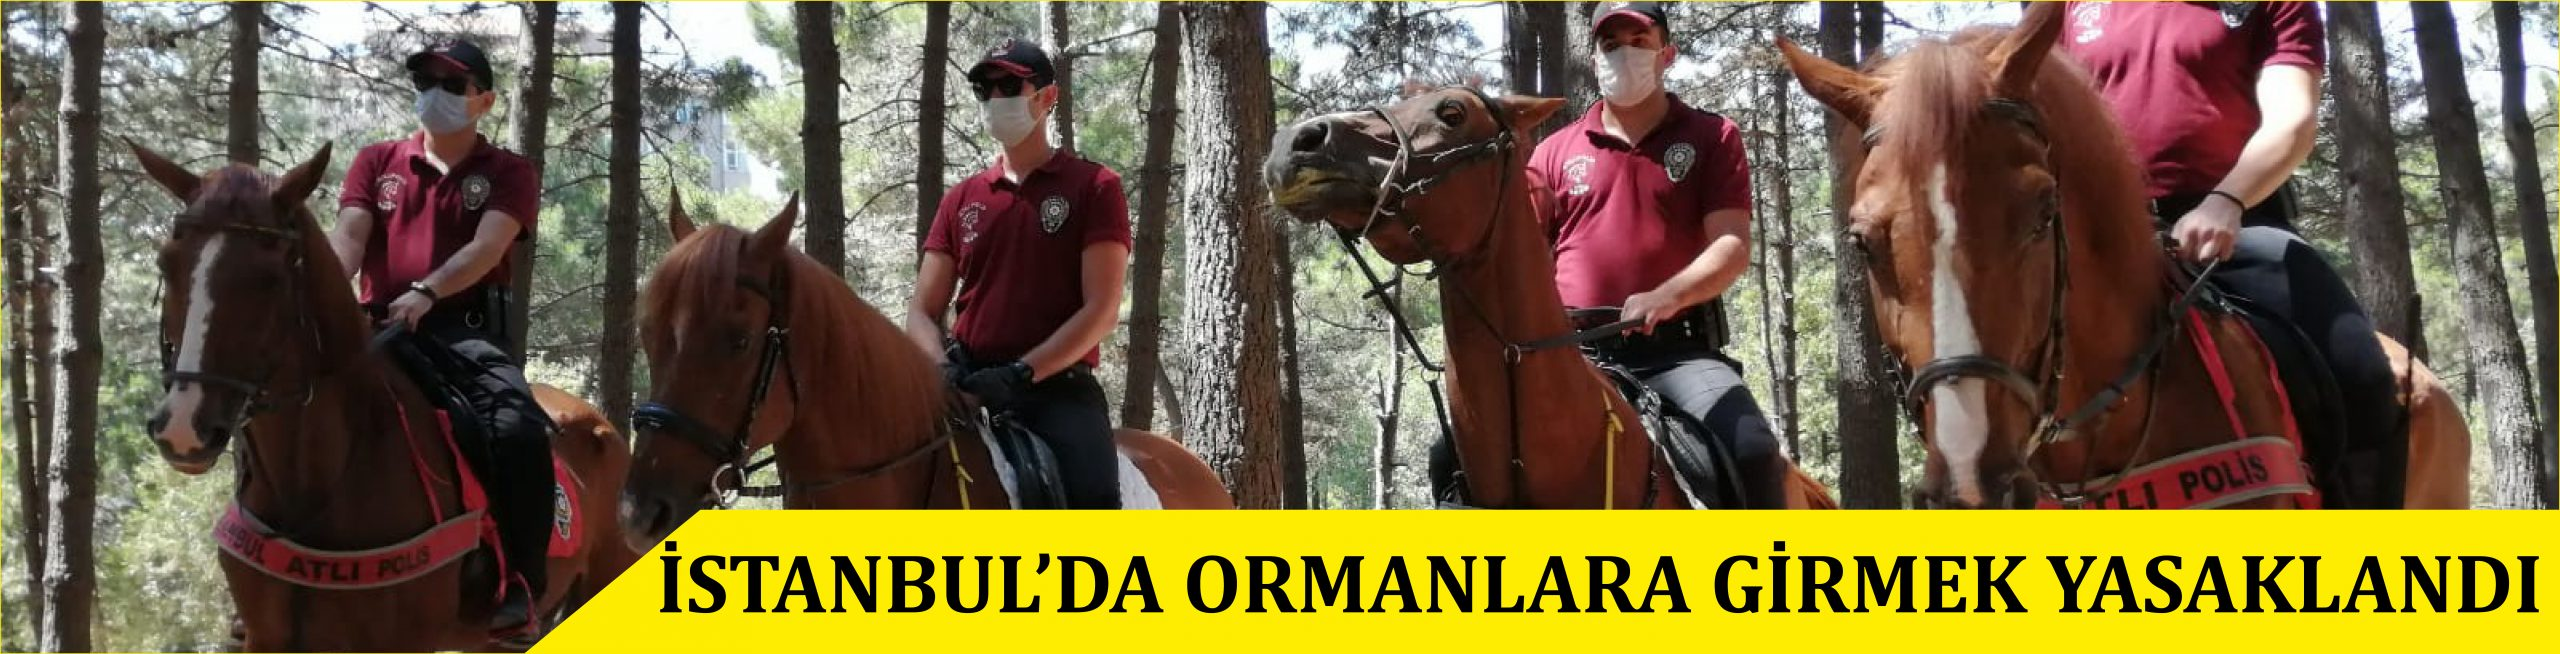 İSTANBUL'DA ORMANLARA GİRMEK YASAKLANDI